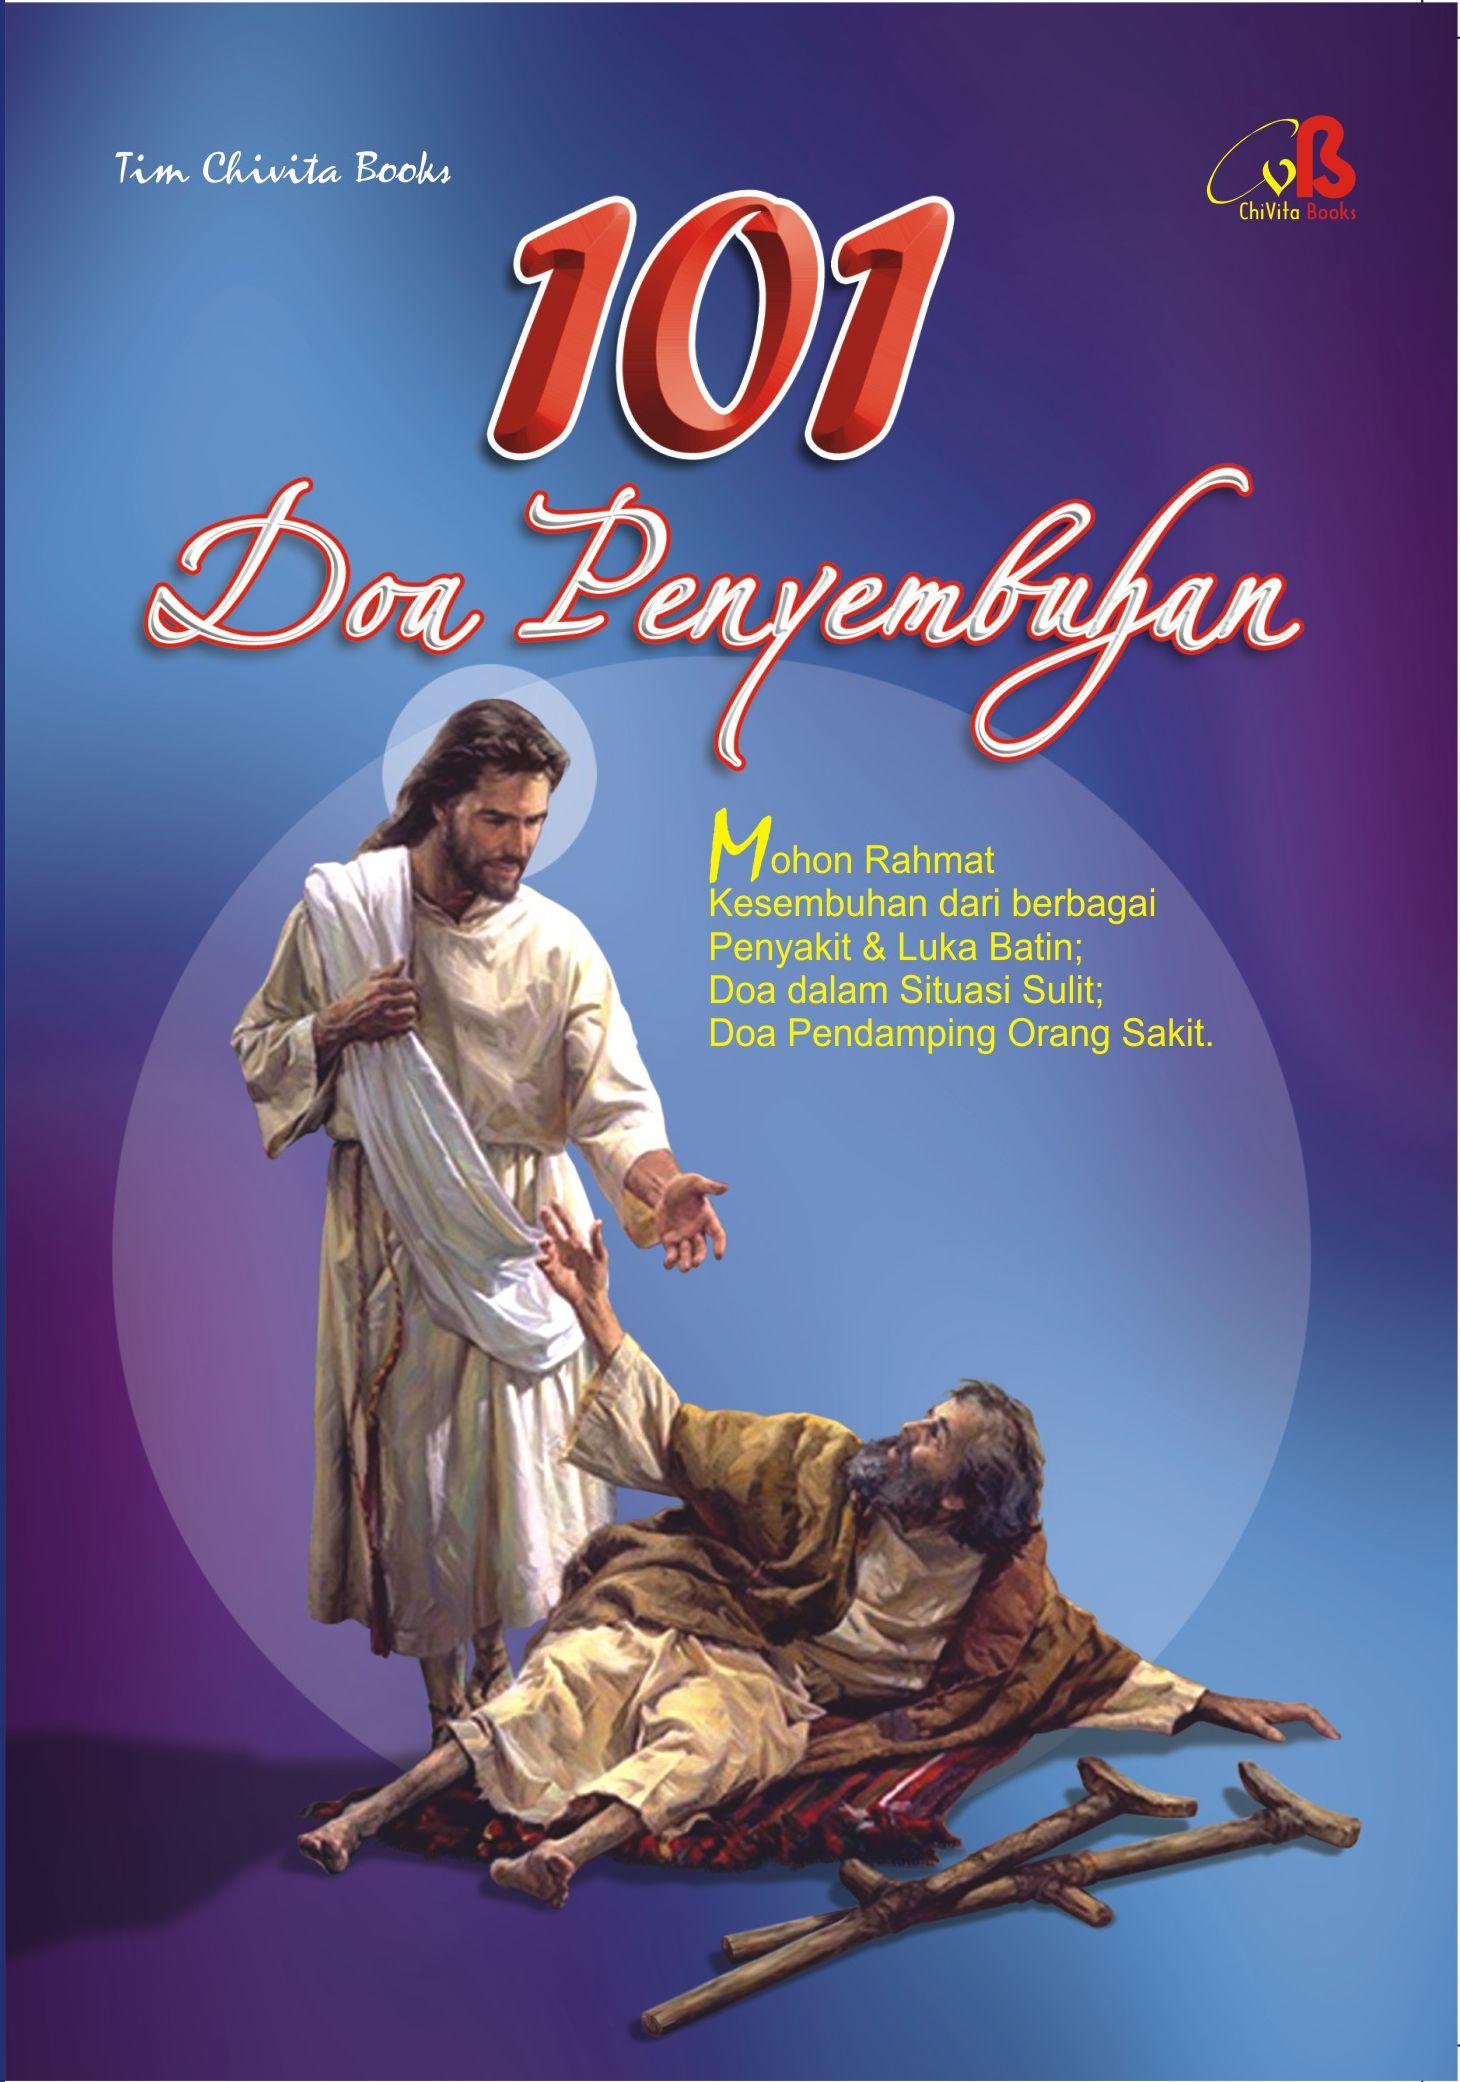 buku doa rohani katolik7 - untuk souvenir - 101 Doa Penyembuhan